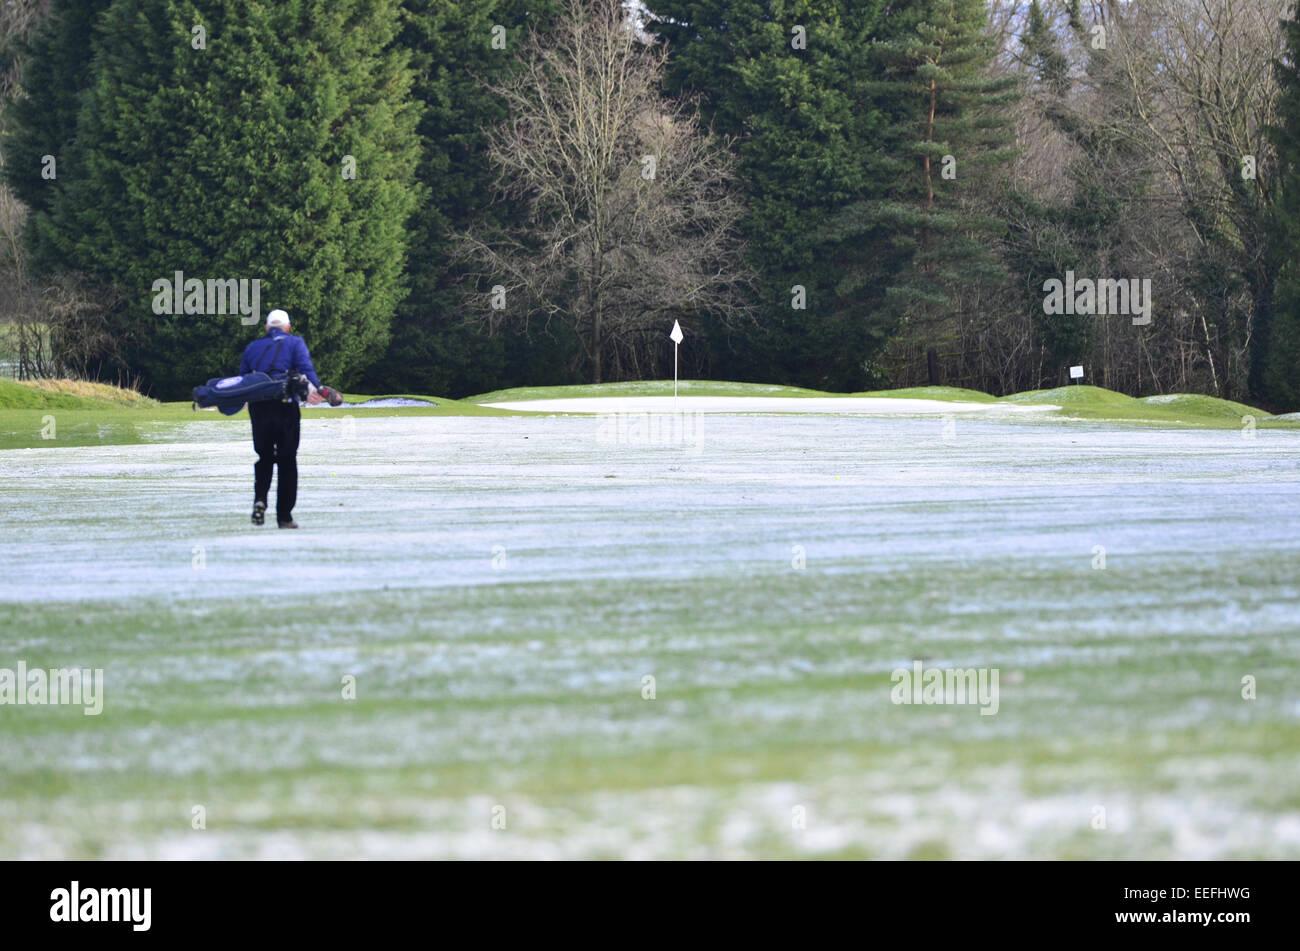 Bristol, UK. 17th Jan, 2015. UK weather. members of Long Ashton Golf Club seen teeing off at their local club regardless - Stock Image